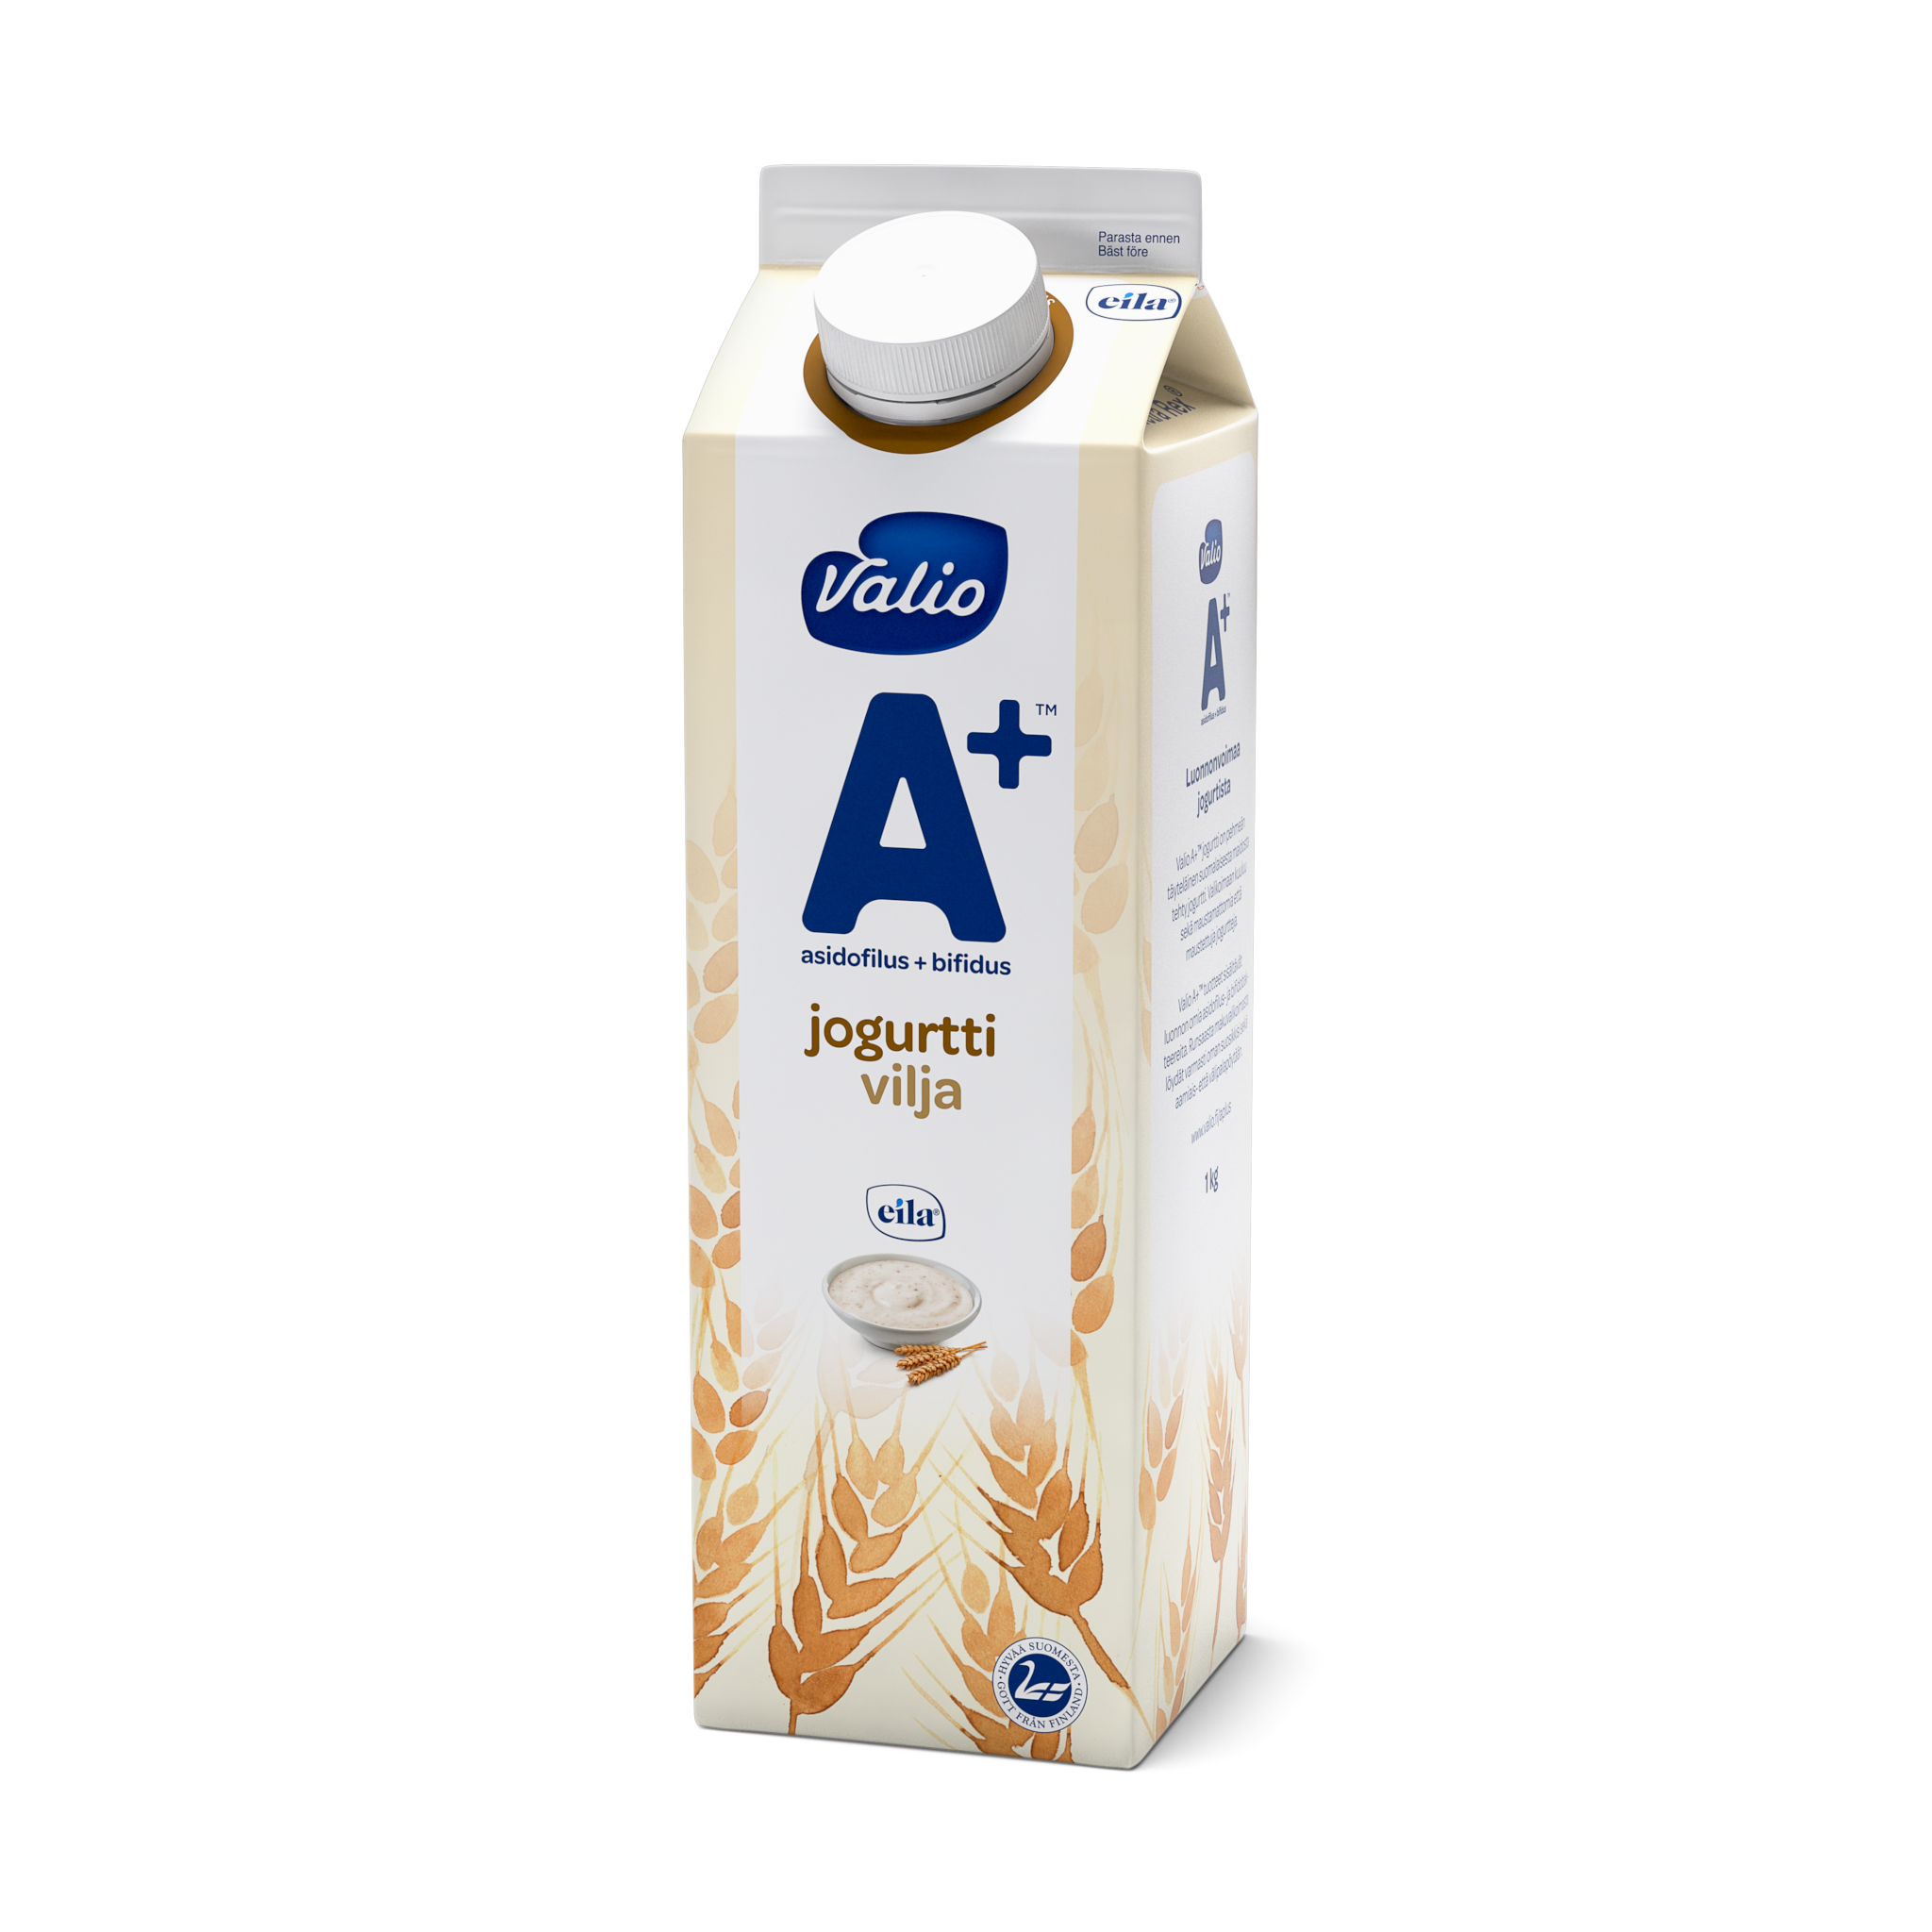 Valio A+™ jogurtti vilja laktoositon®